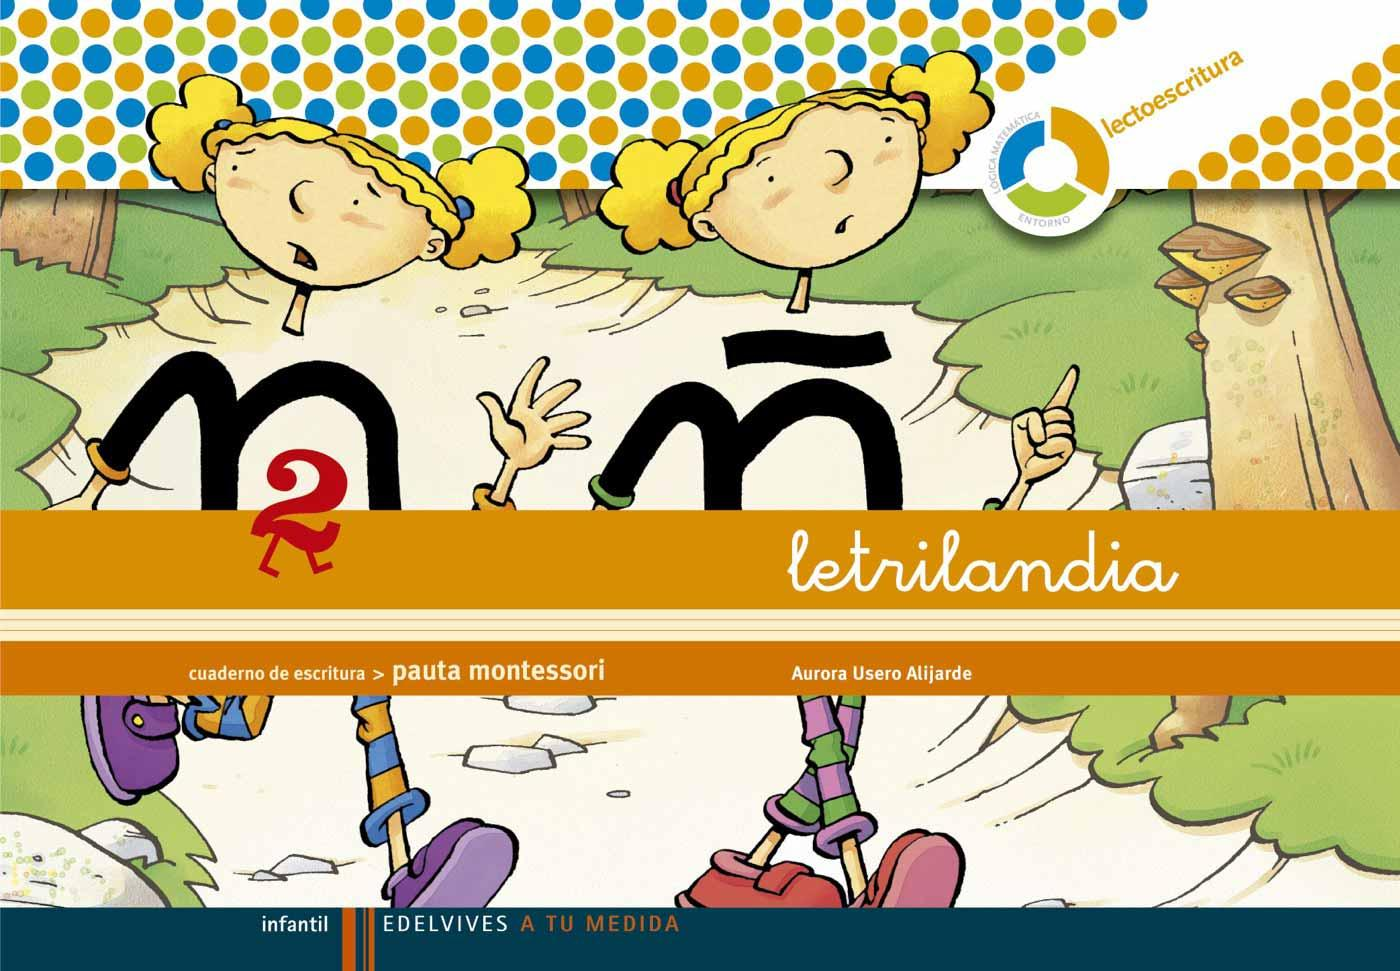 Libro De Texto 3 Infantil Letrilandia Lectoescritura Cuaderno 2 Pauta Montessori 10 26